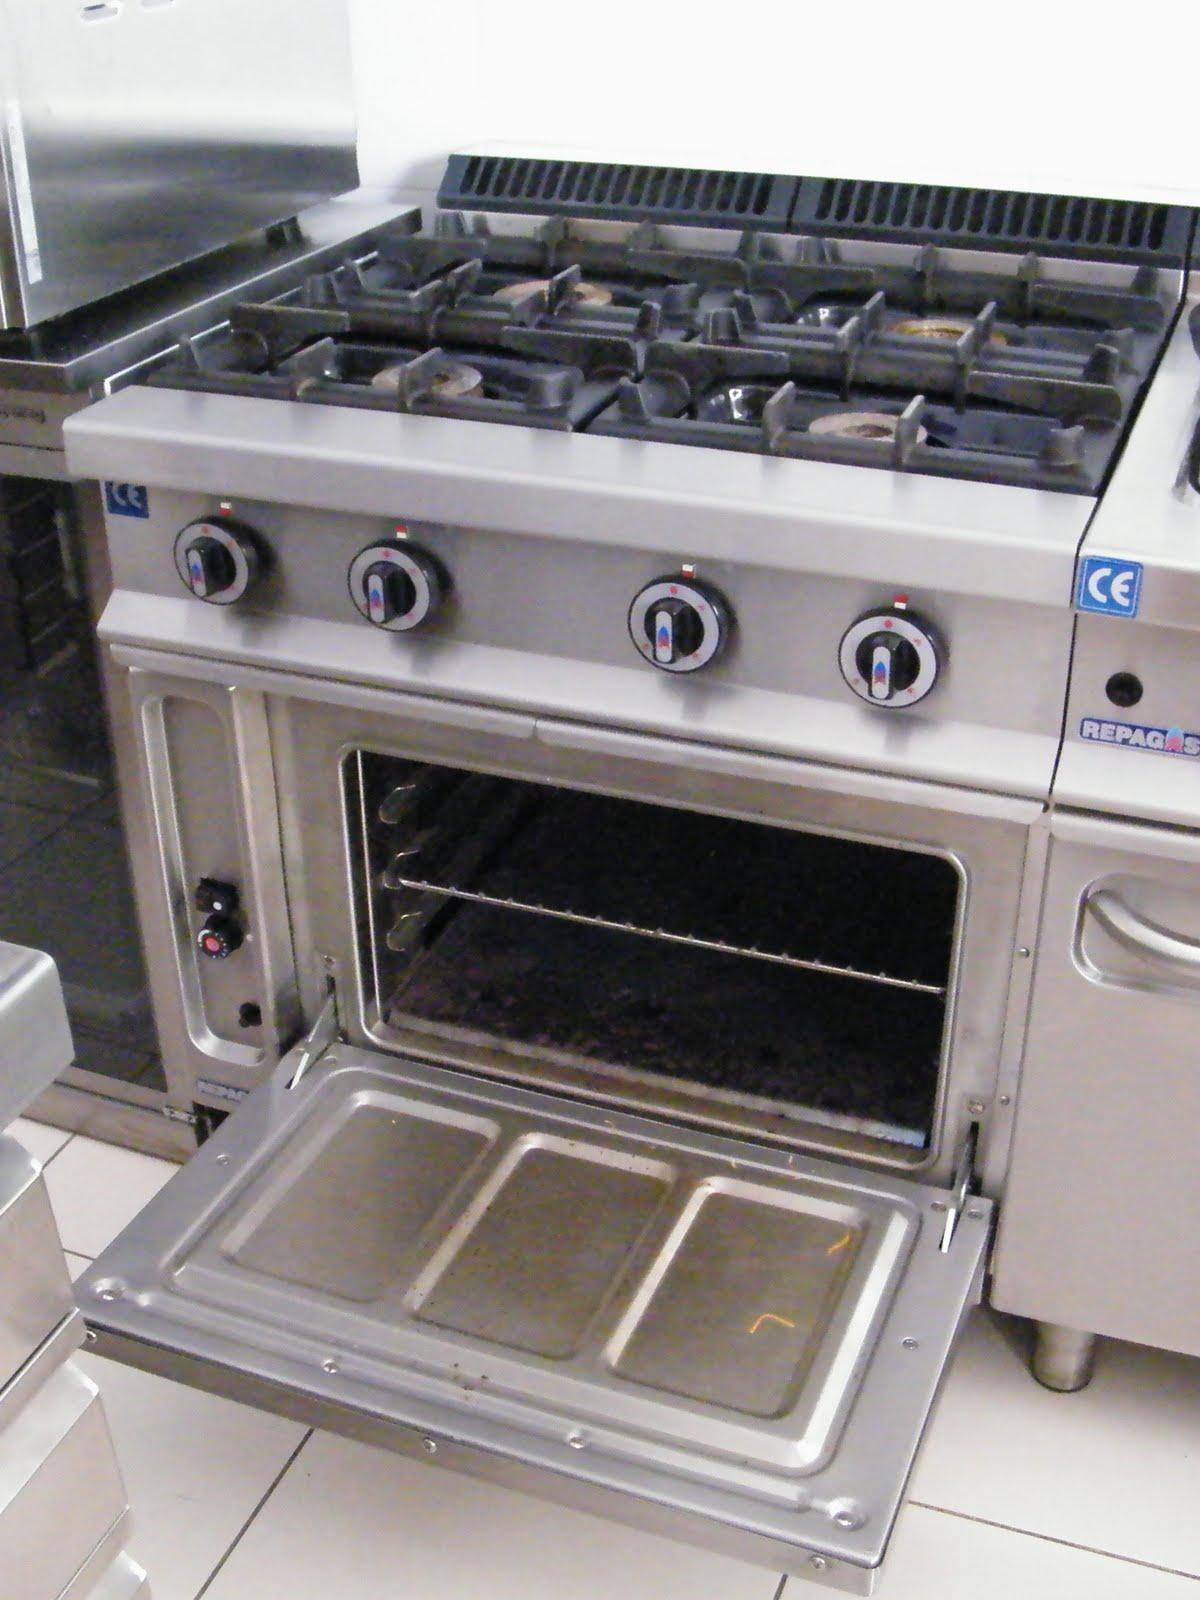 Venta material hosteleria segunda mano cocina gas 4 for Horno hosteleria segunda mano